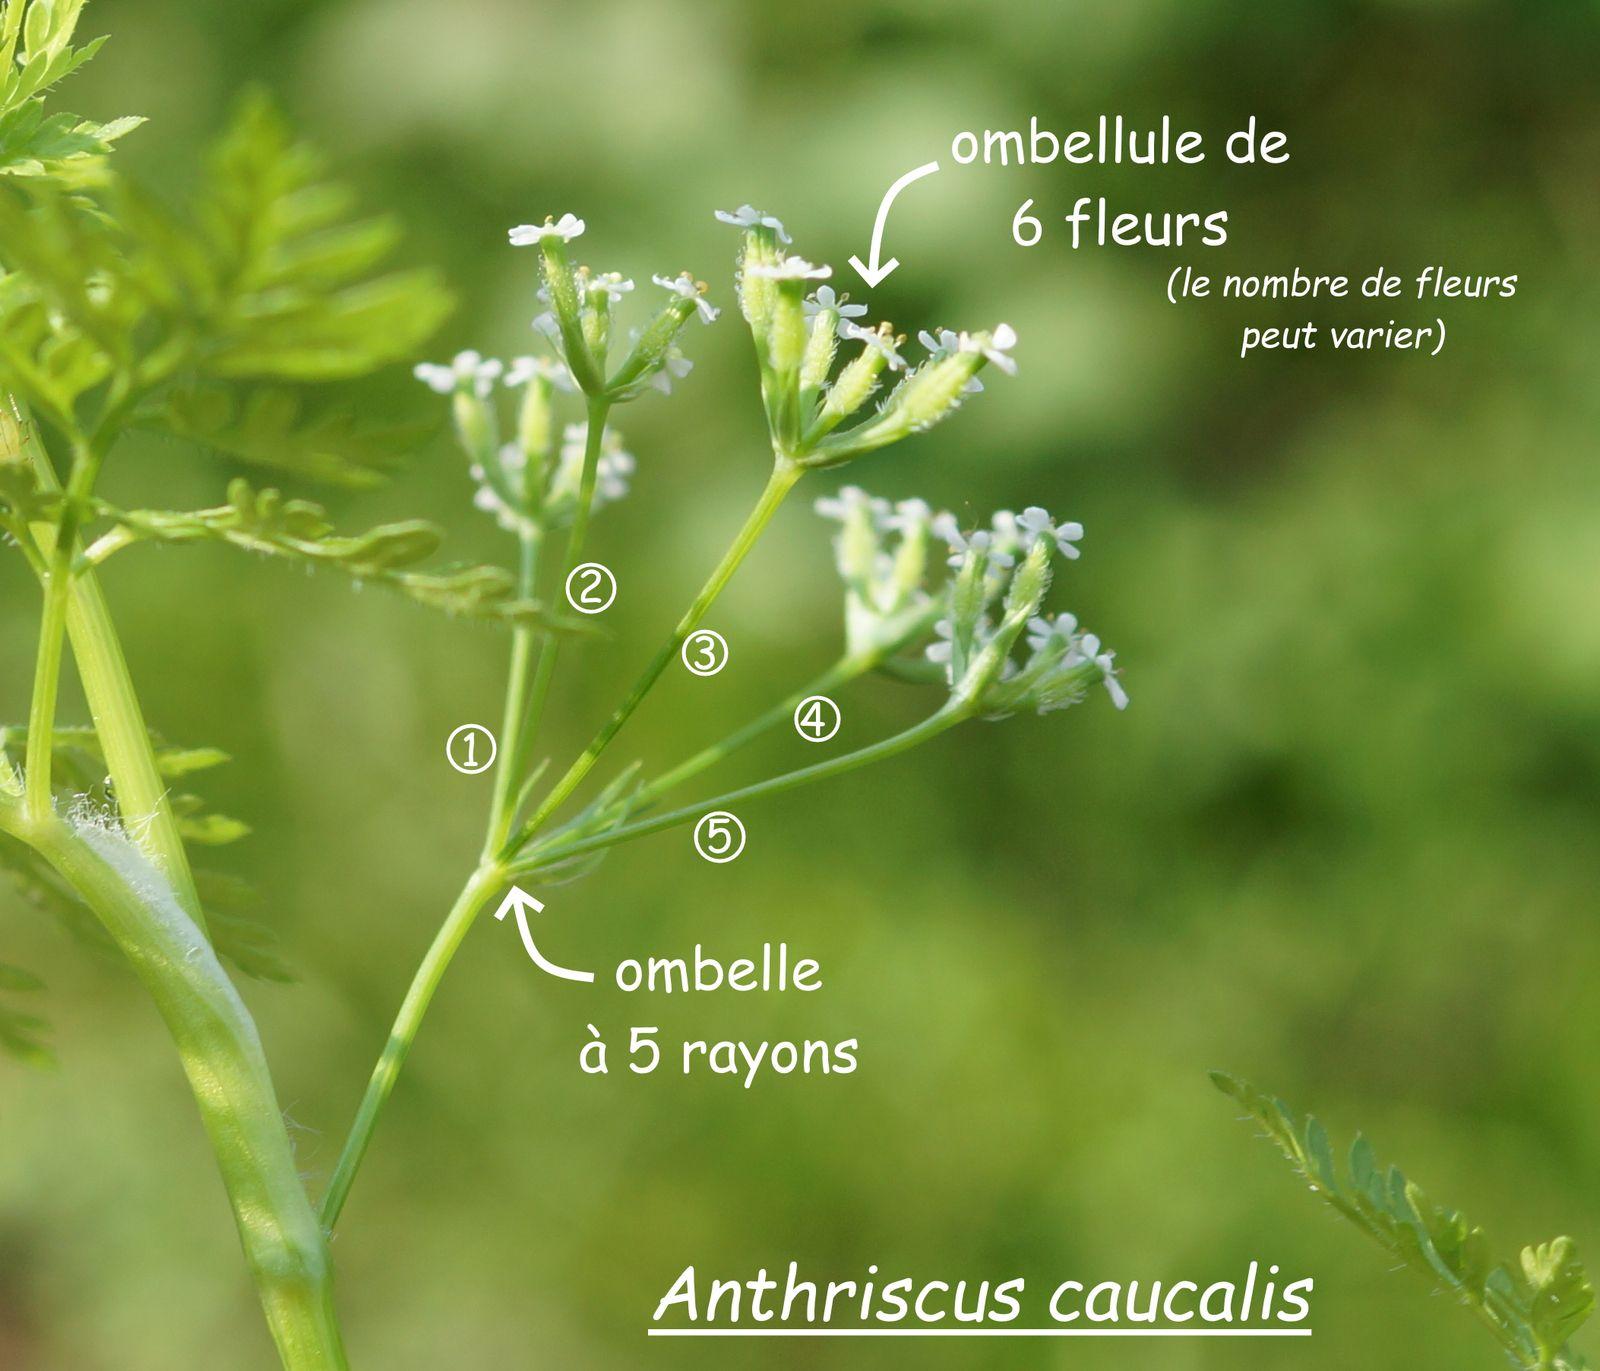 Ombelles d'Anthriscus caucalis et d'Anthriscus sylvestris